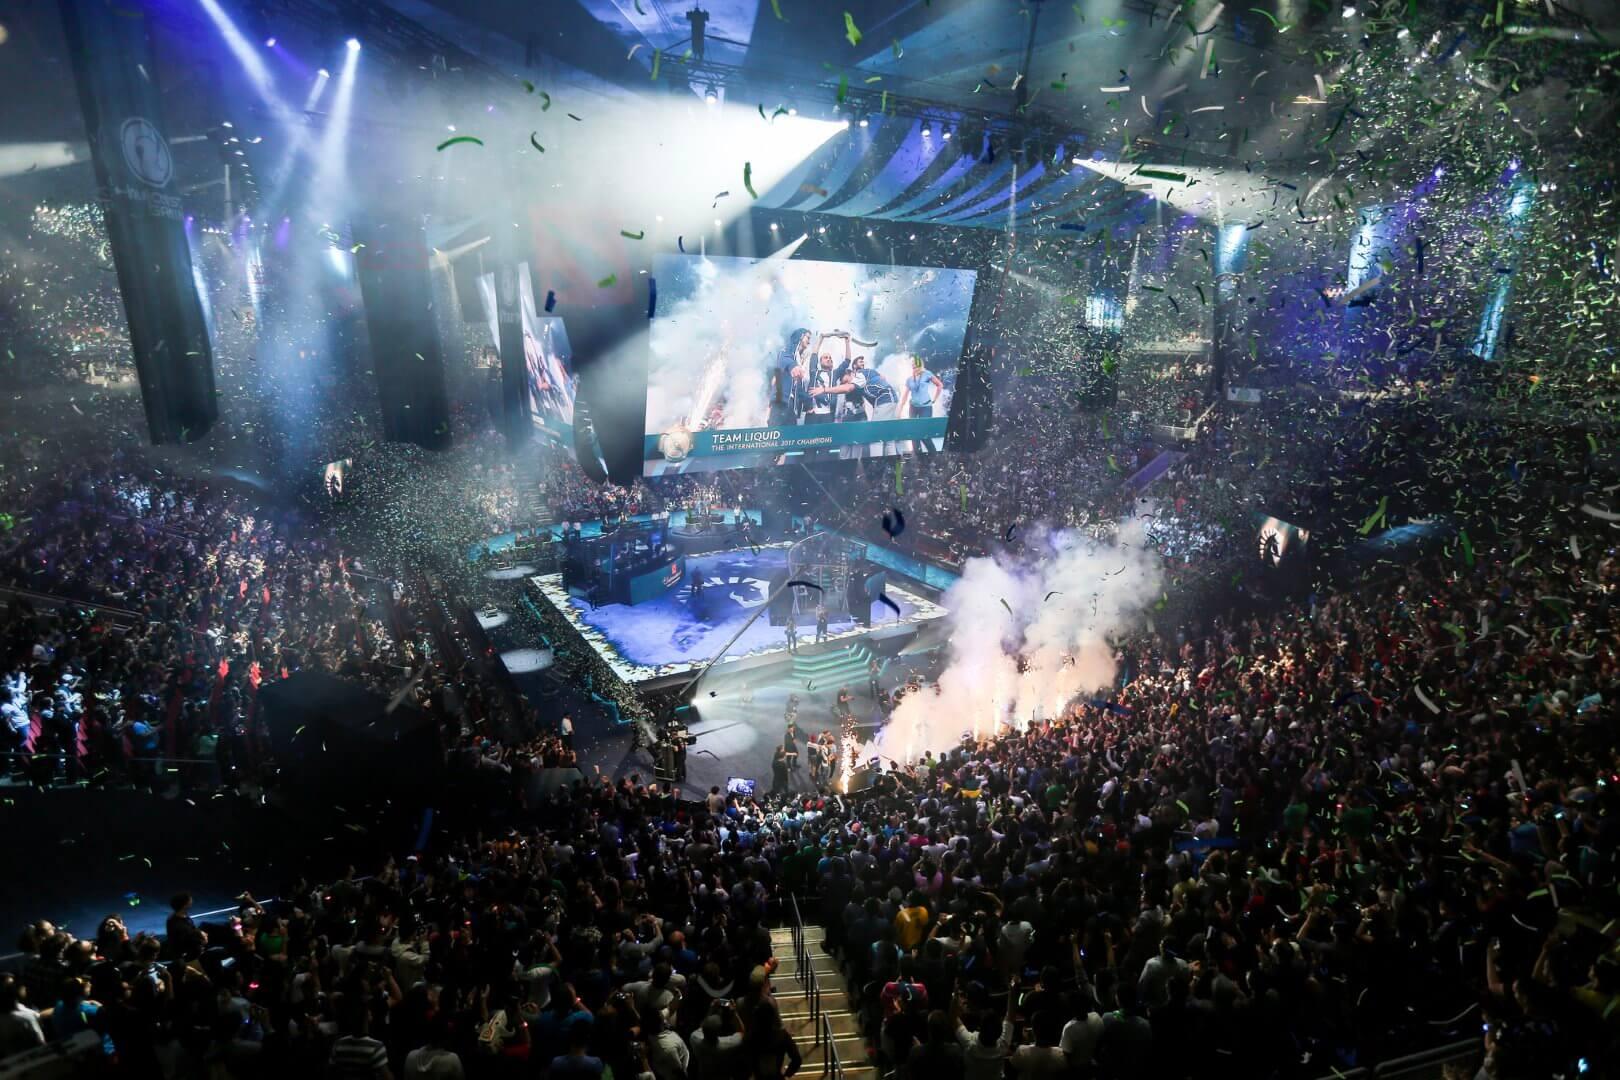 Team Liquid brought home 10 million dollars winning The International 7 - Valve